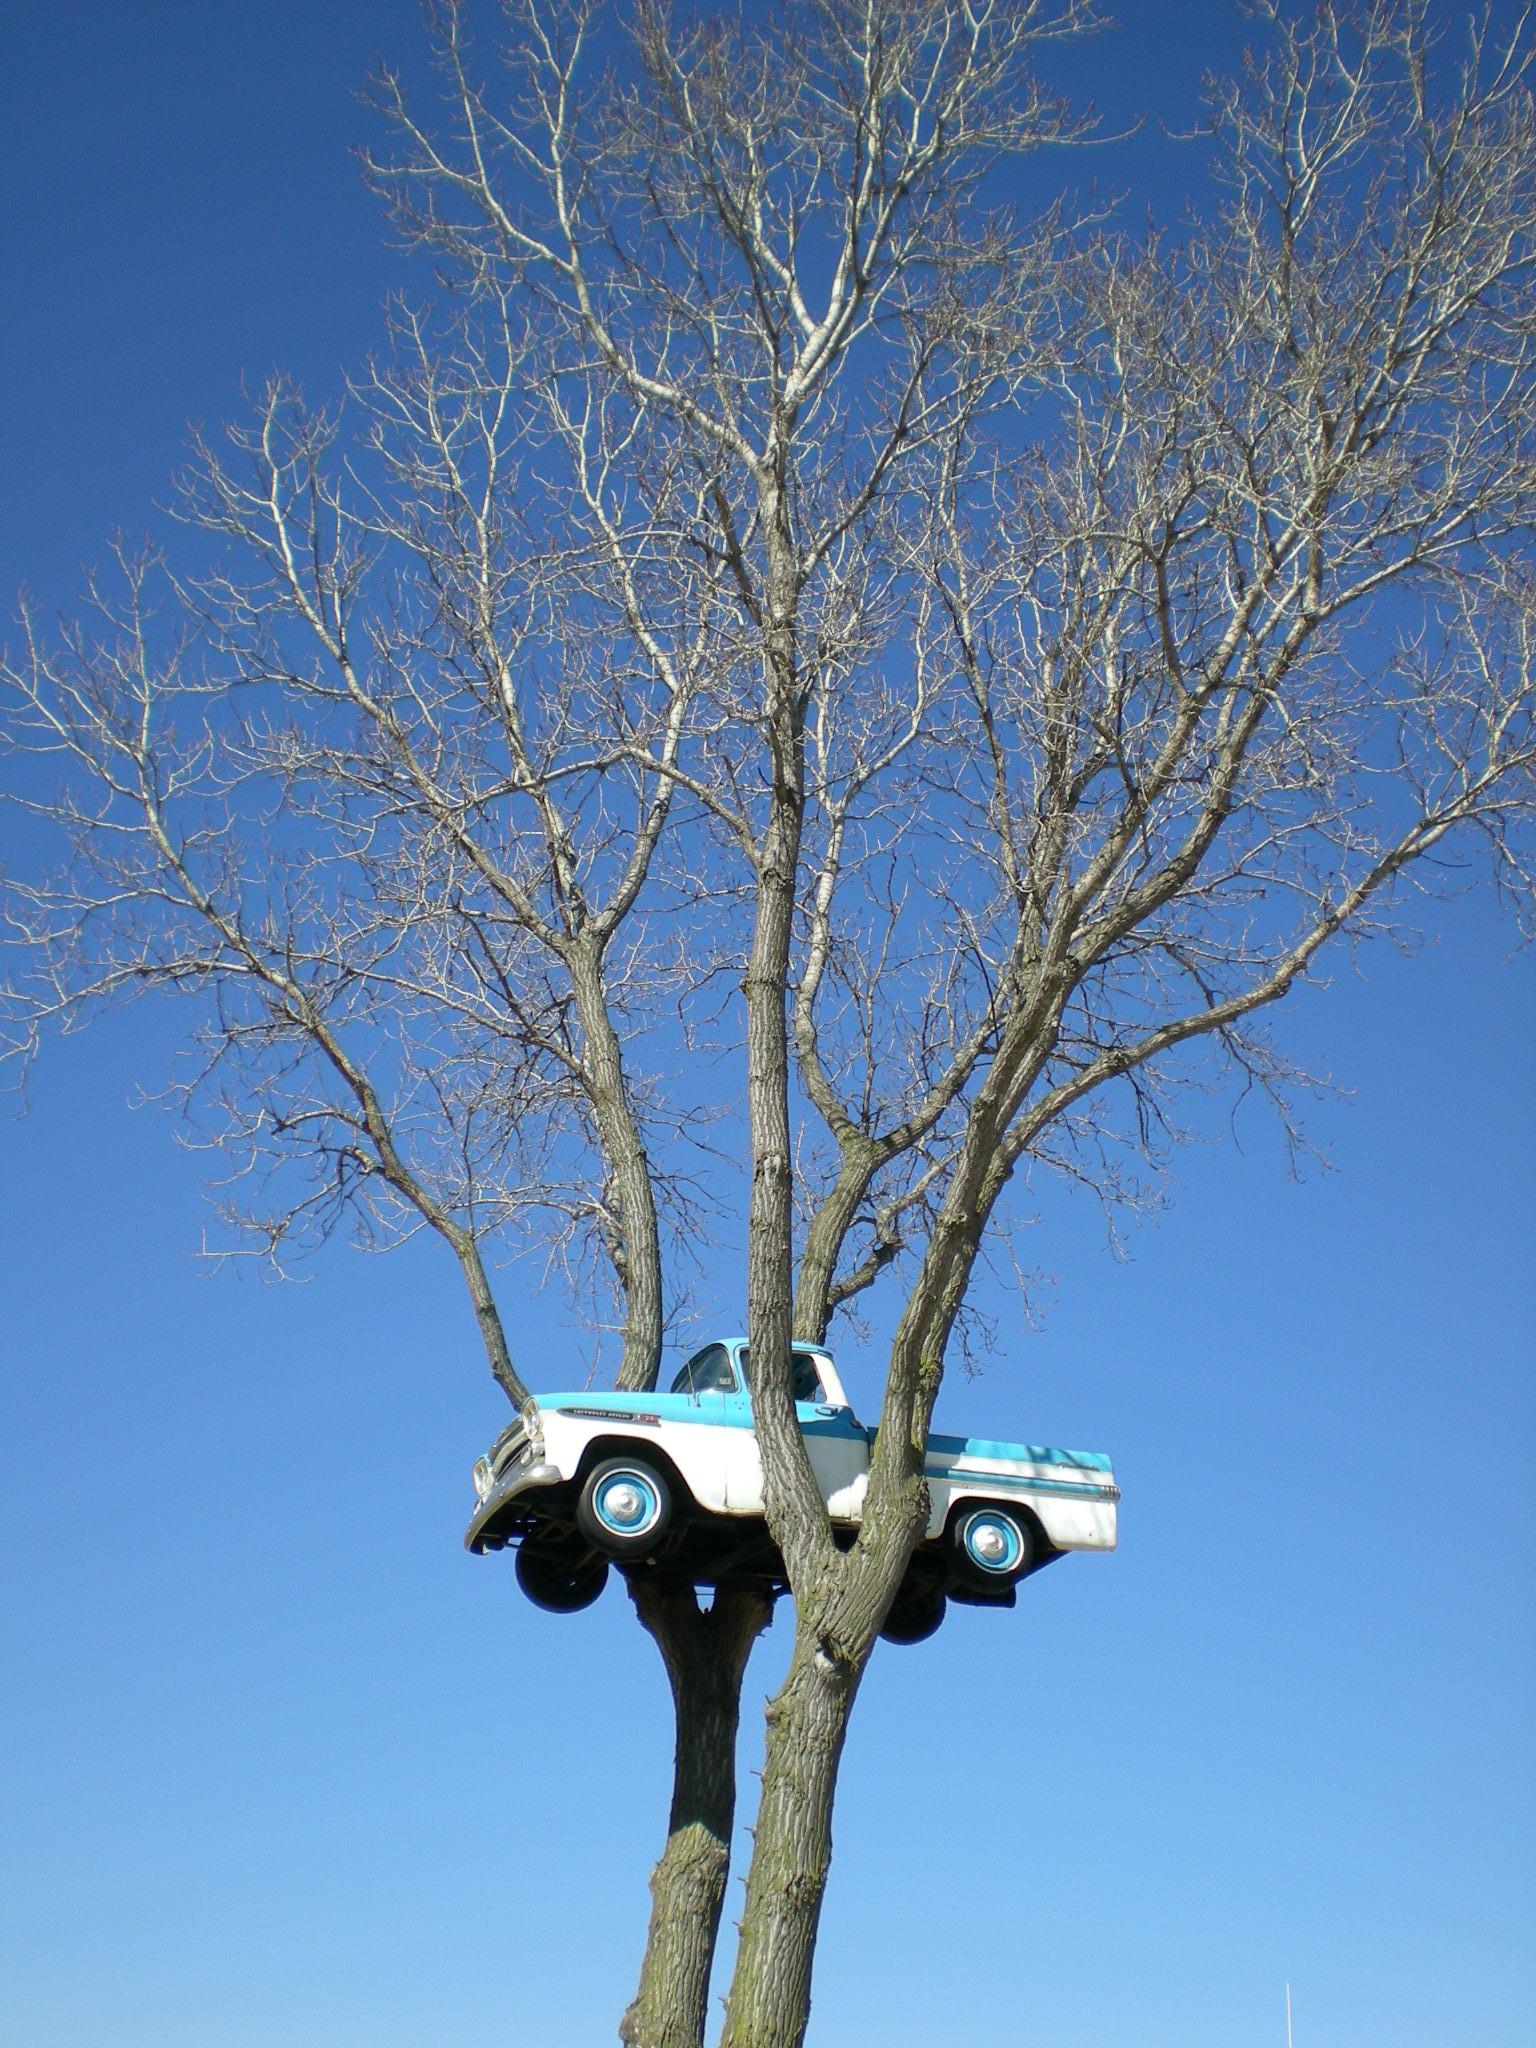 Odd Wisconsin Attractions Clinton S Truck In The Tree Portal Wisconsin Blog